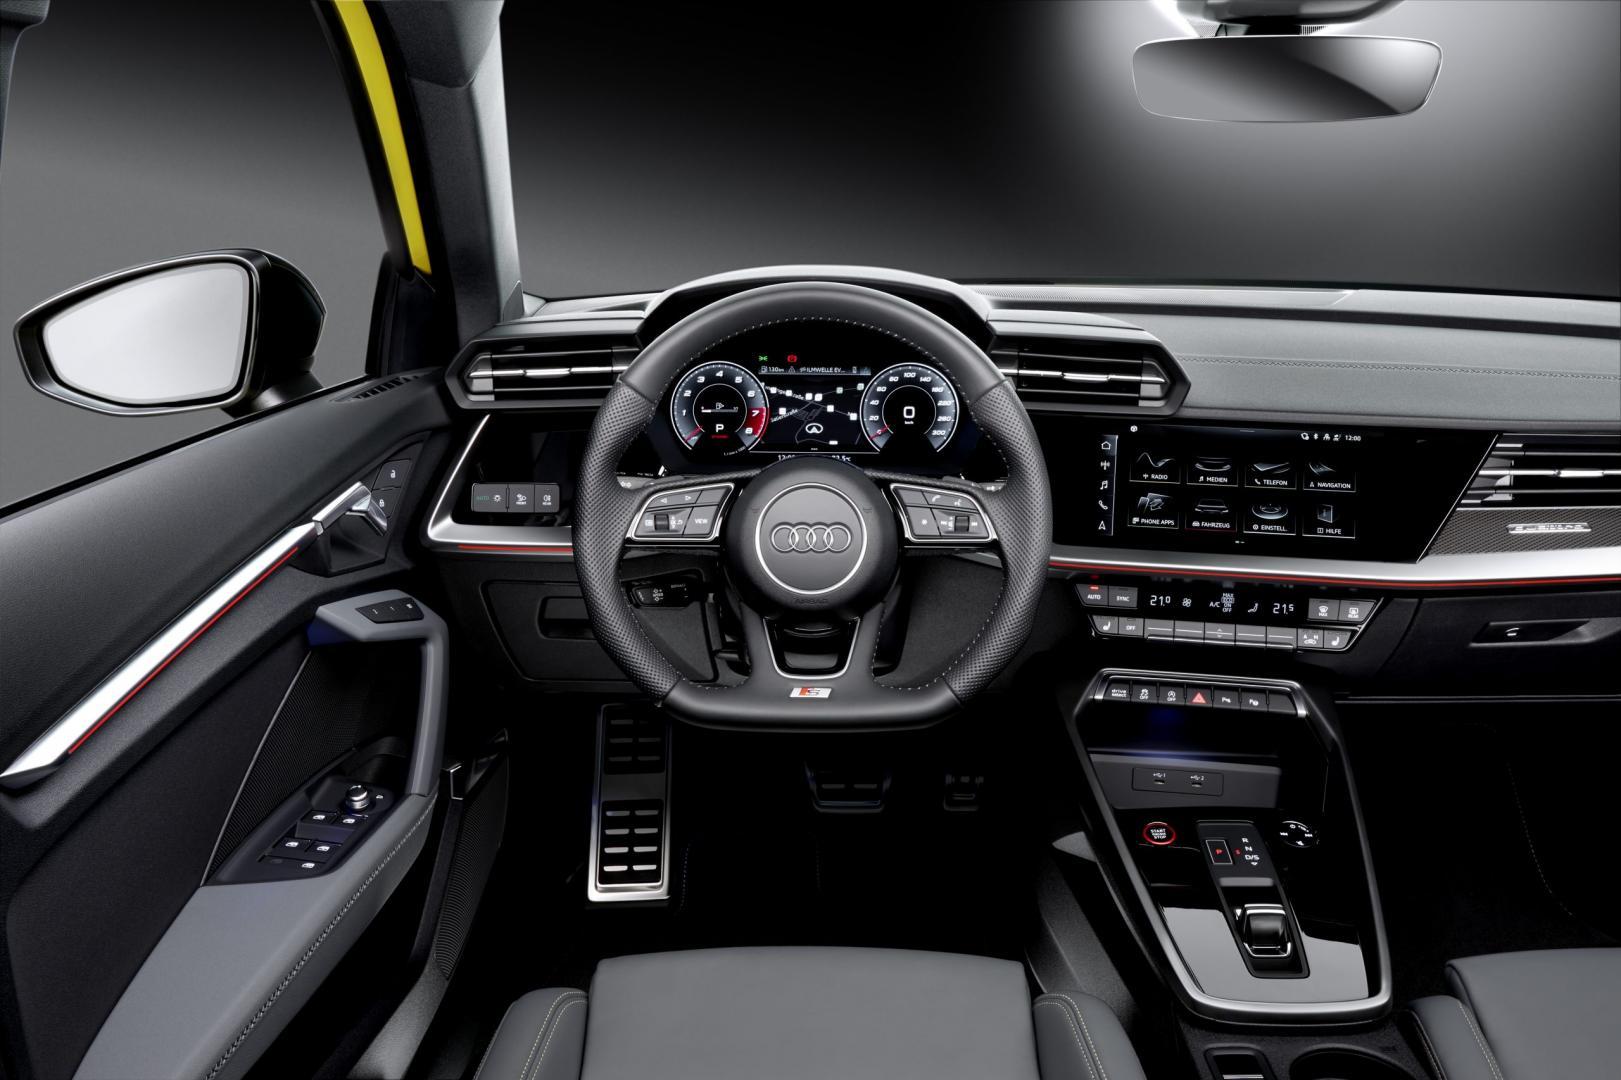 Interieur Audi S3 Sportback (2020) - Imola Gelb (Geel)